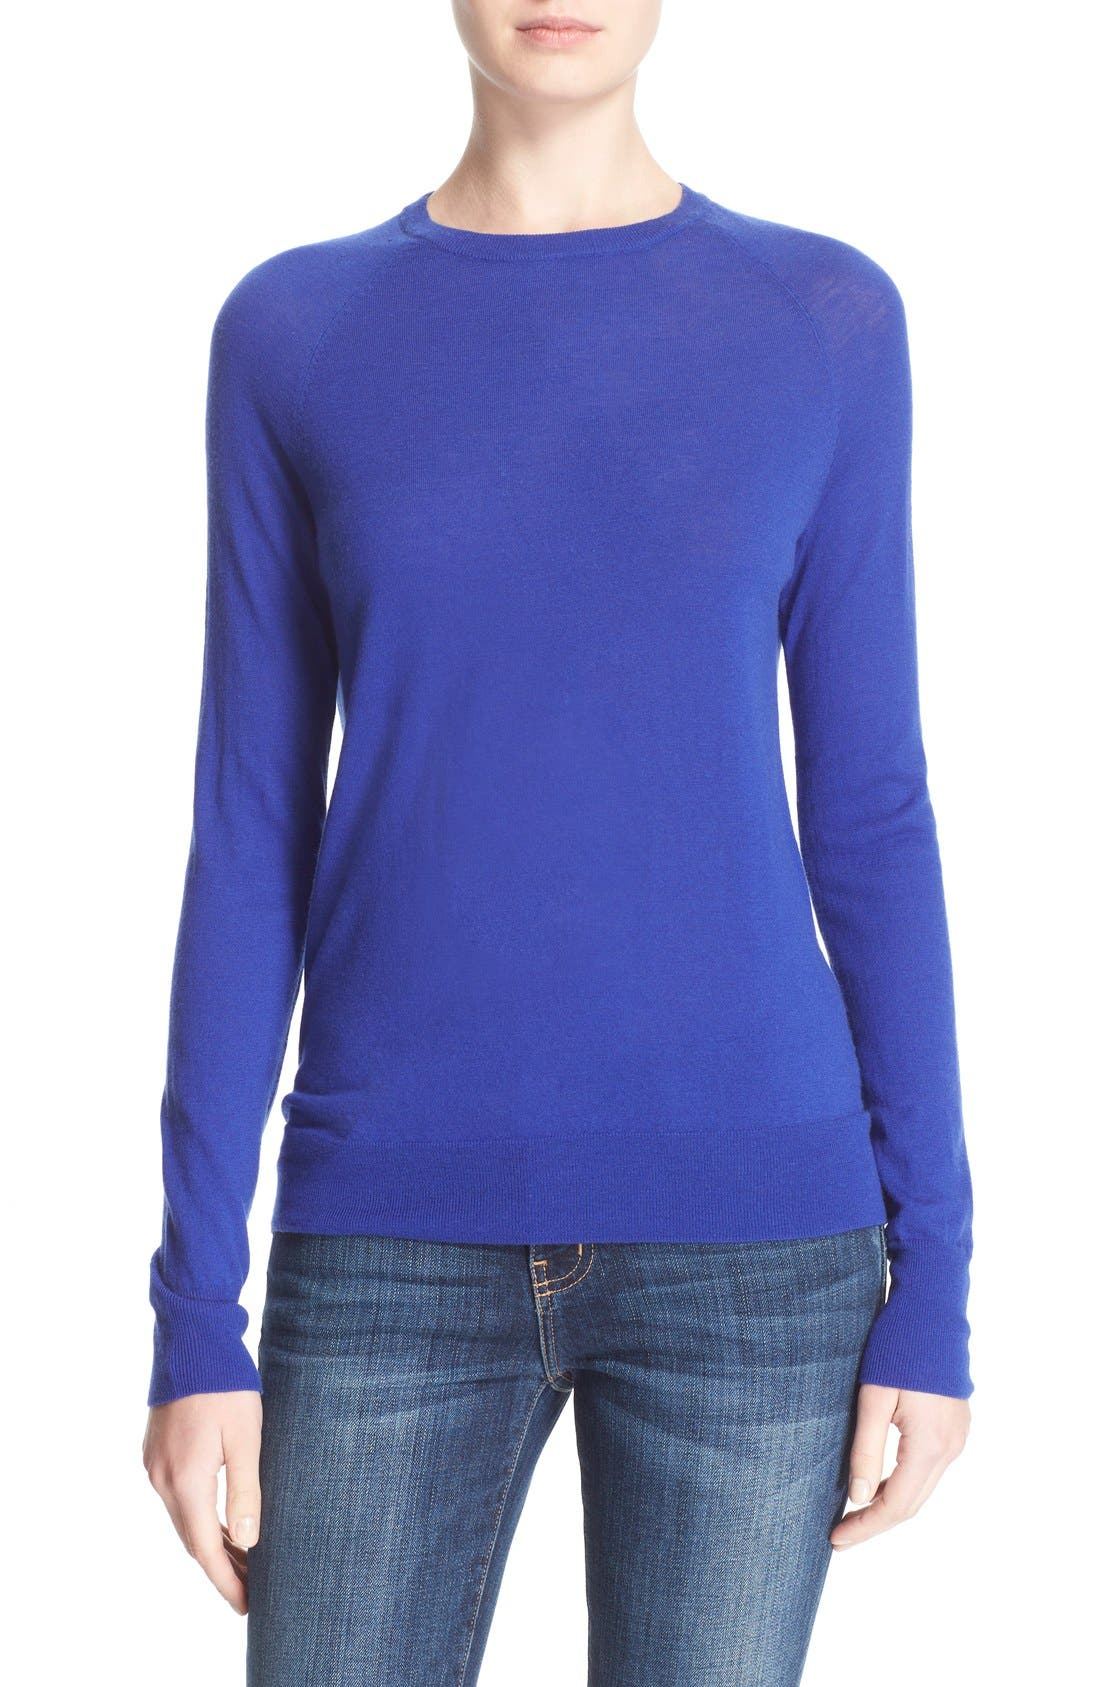 Alternate Image 1 Selected - Equipment 'Sloane' Crewneck Sweater